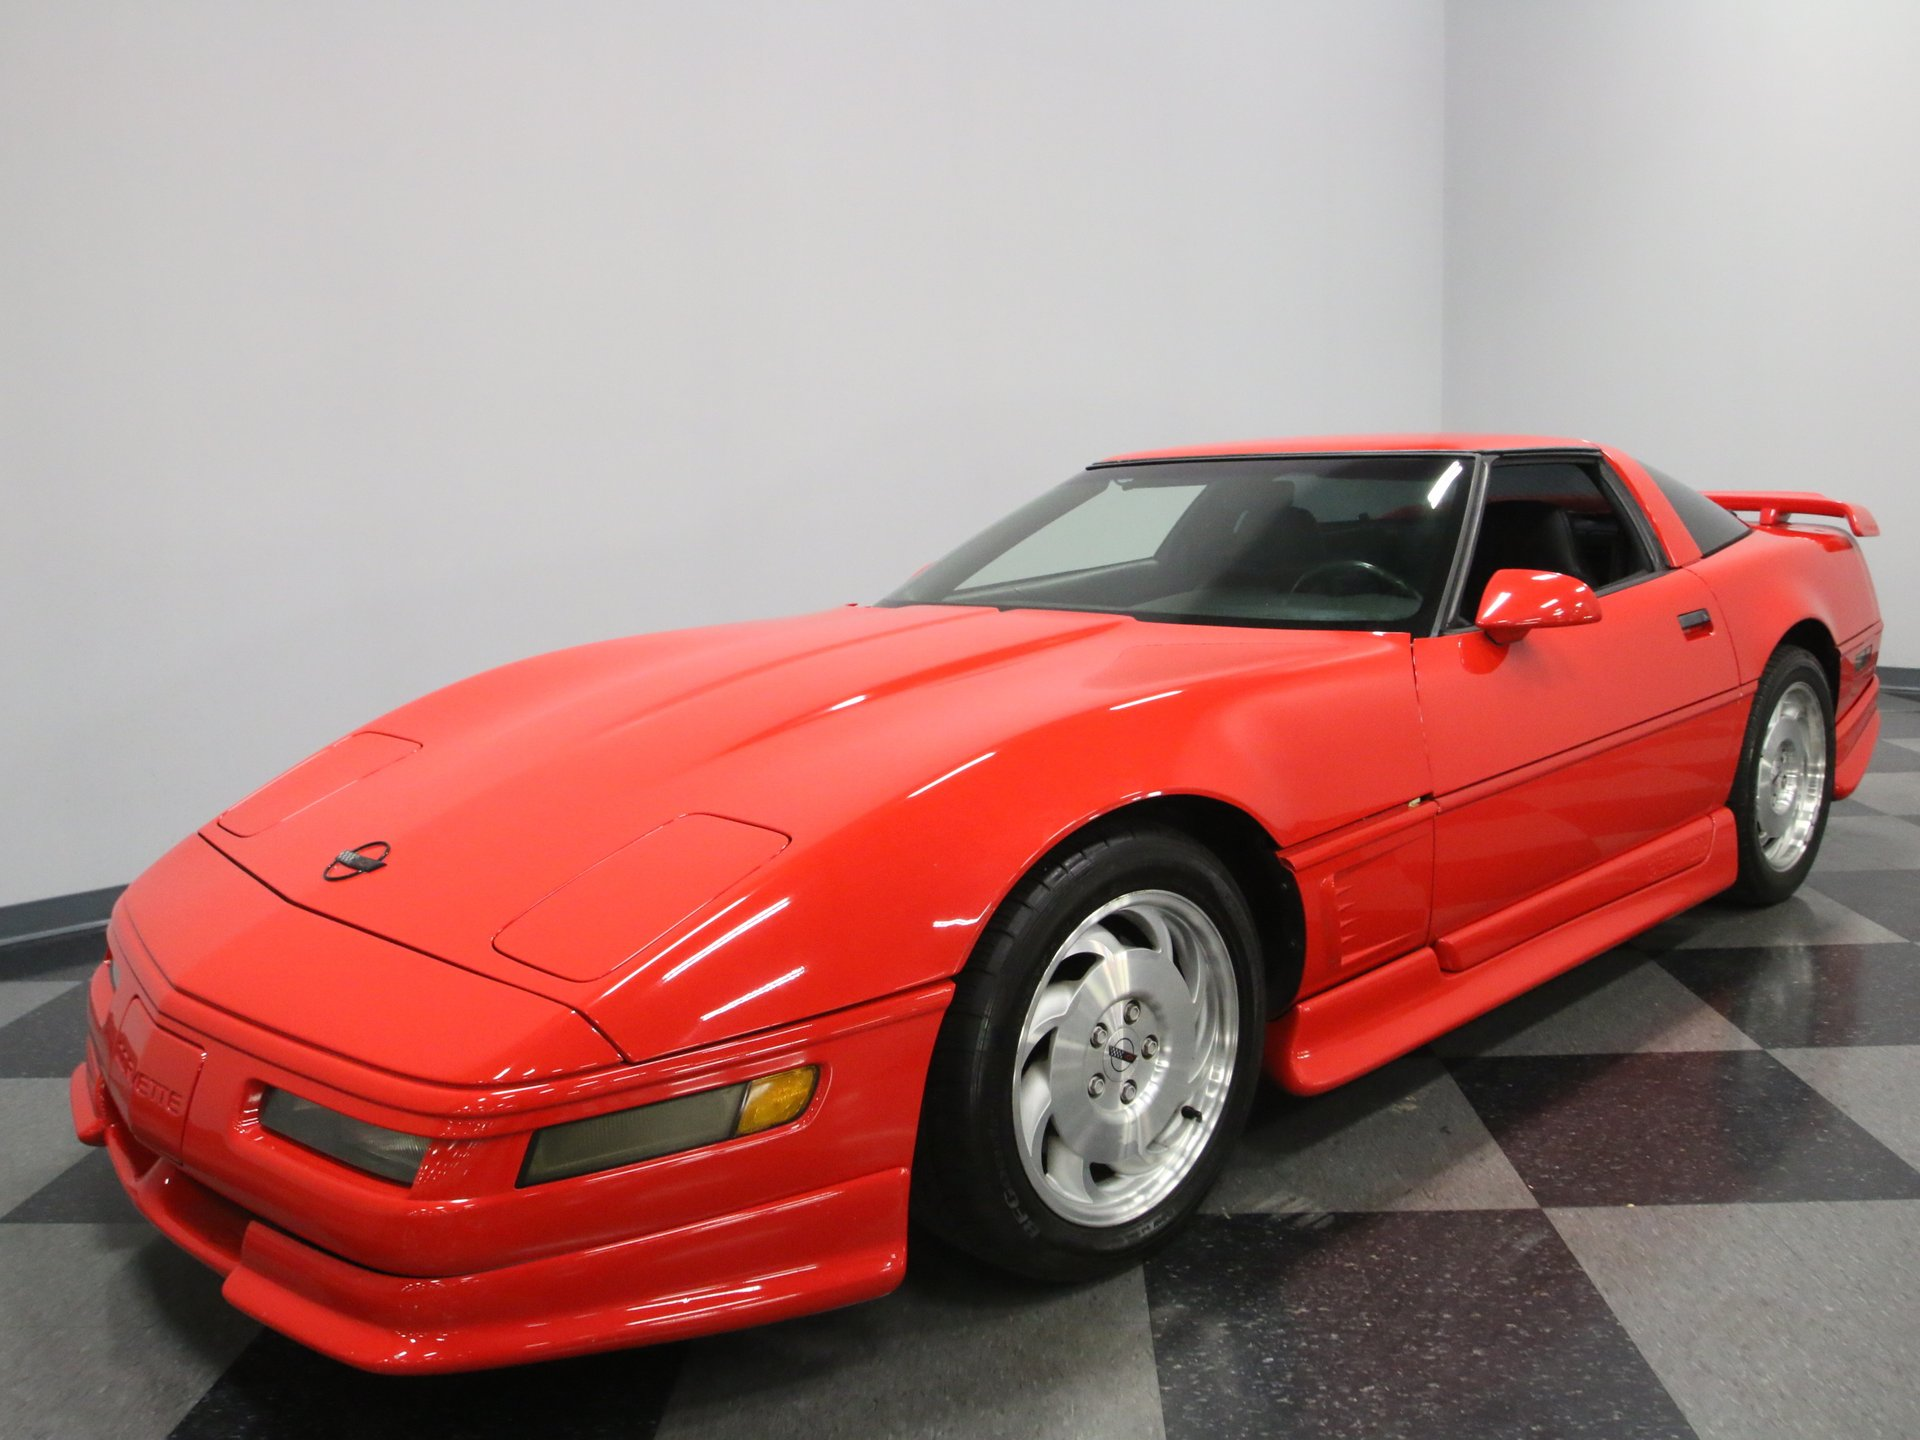 1996 Chevrolet Corvette | Streetside Classics - The Nation's